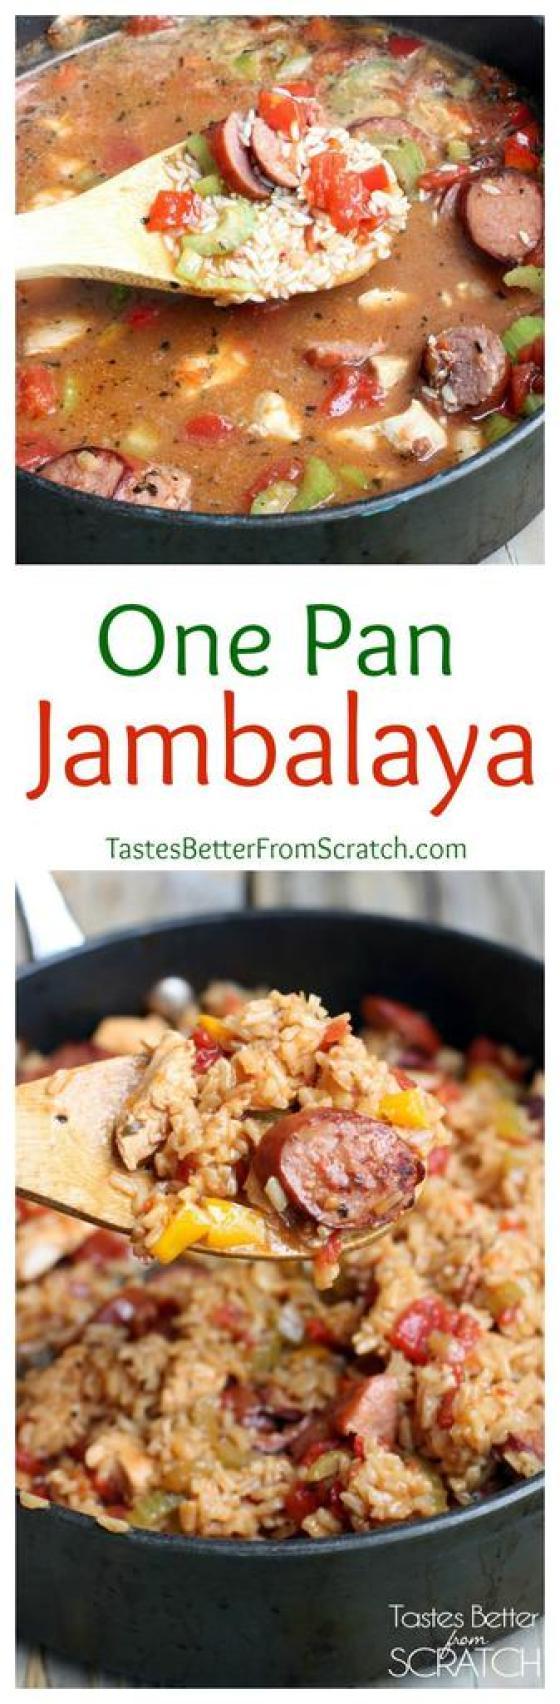 One Pan Chicken and Sausage Jambalaya recipe on TastesBetterFromScratch.com